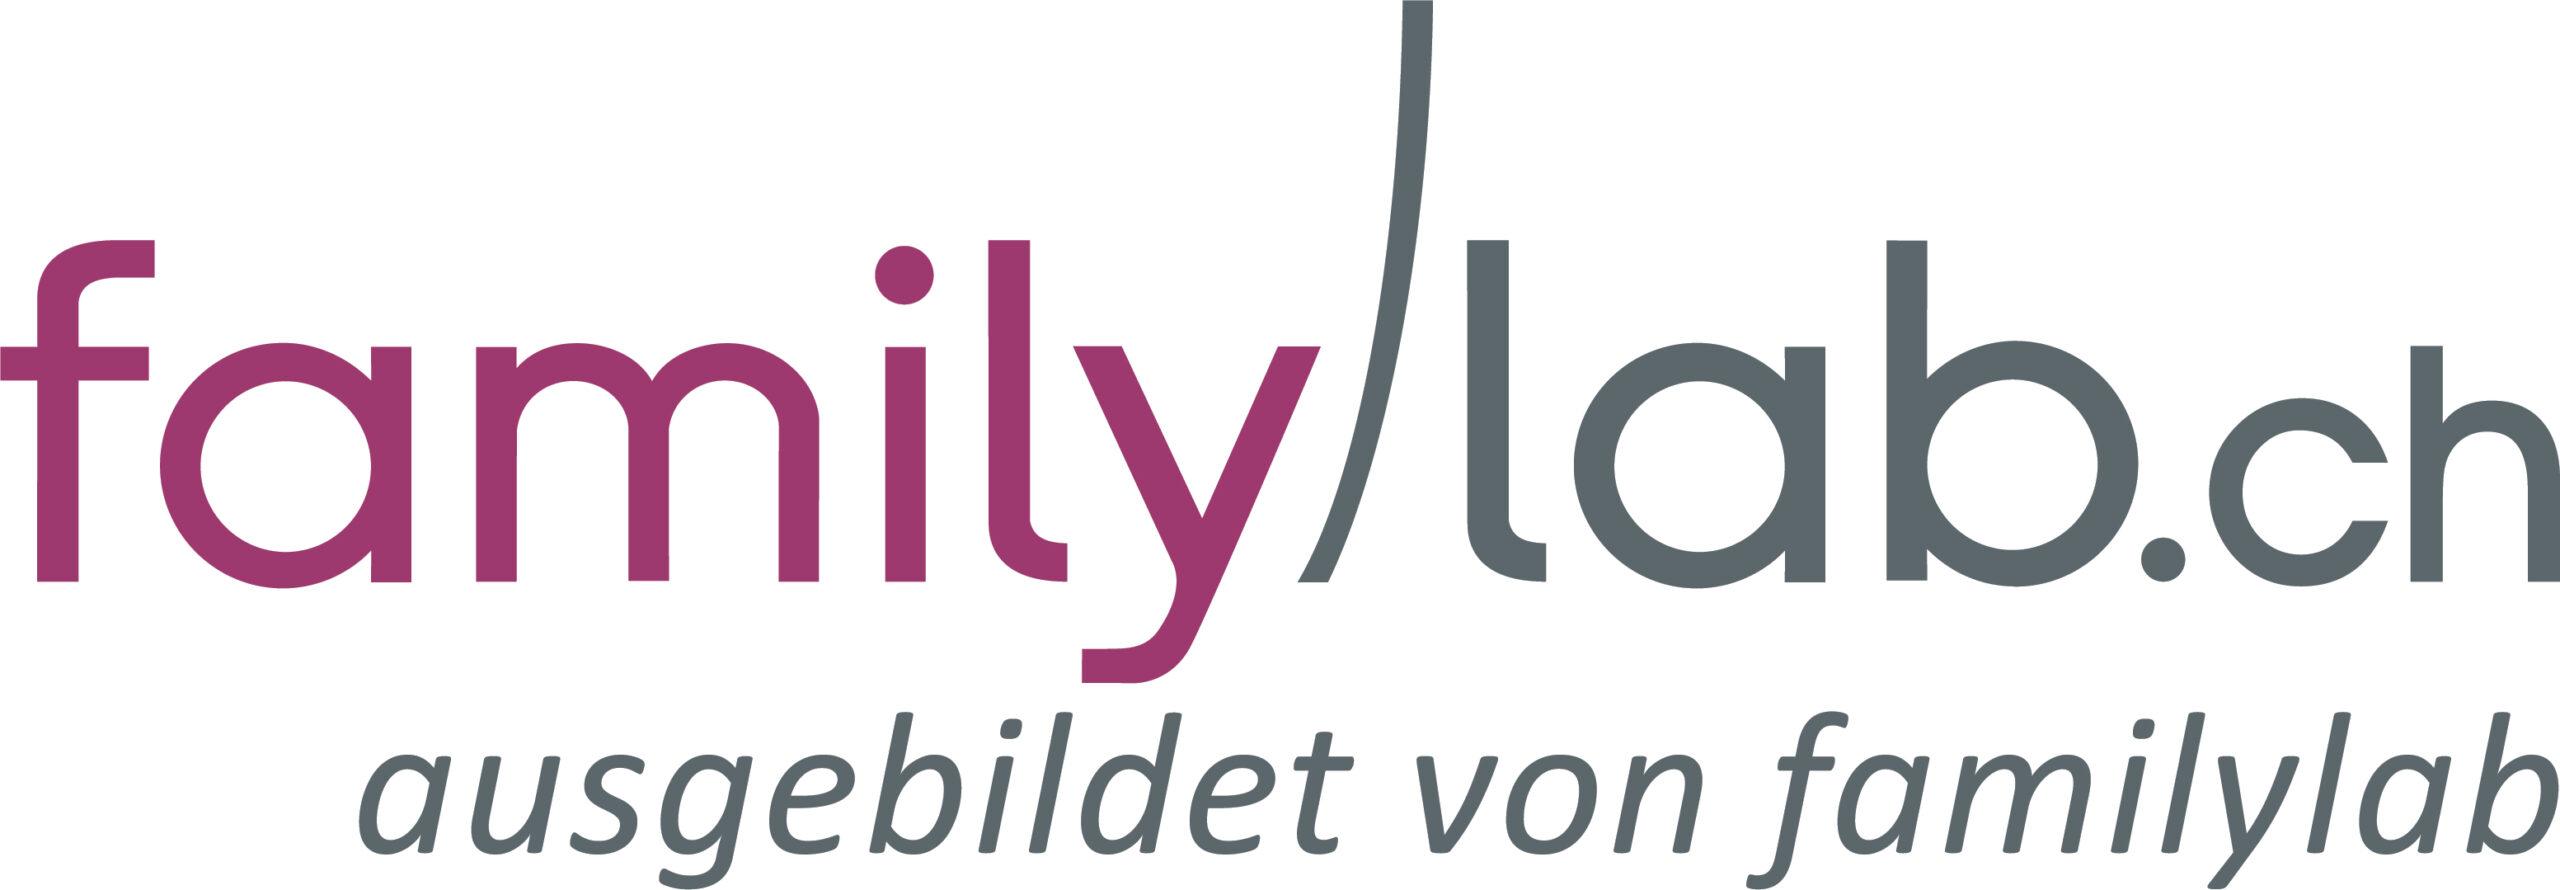 Logo familylab.ch - Partnerorganisatin der Momokitas